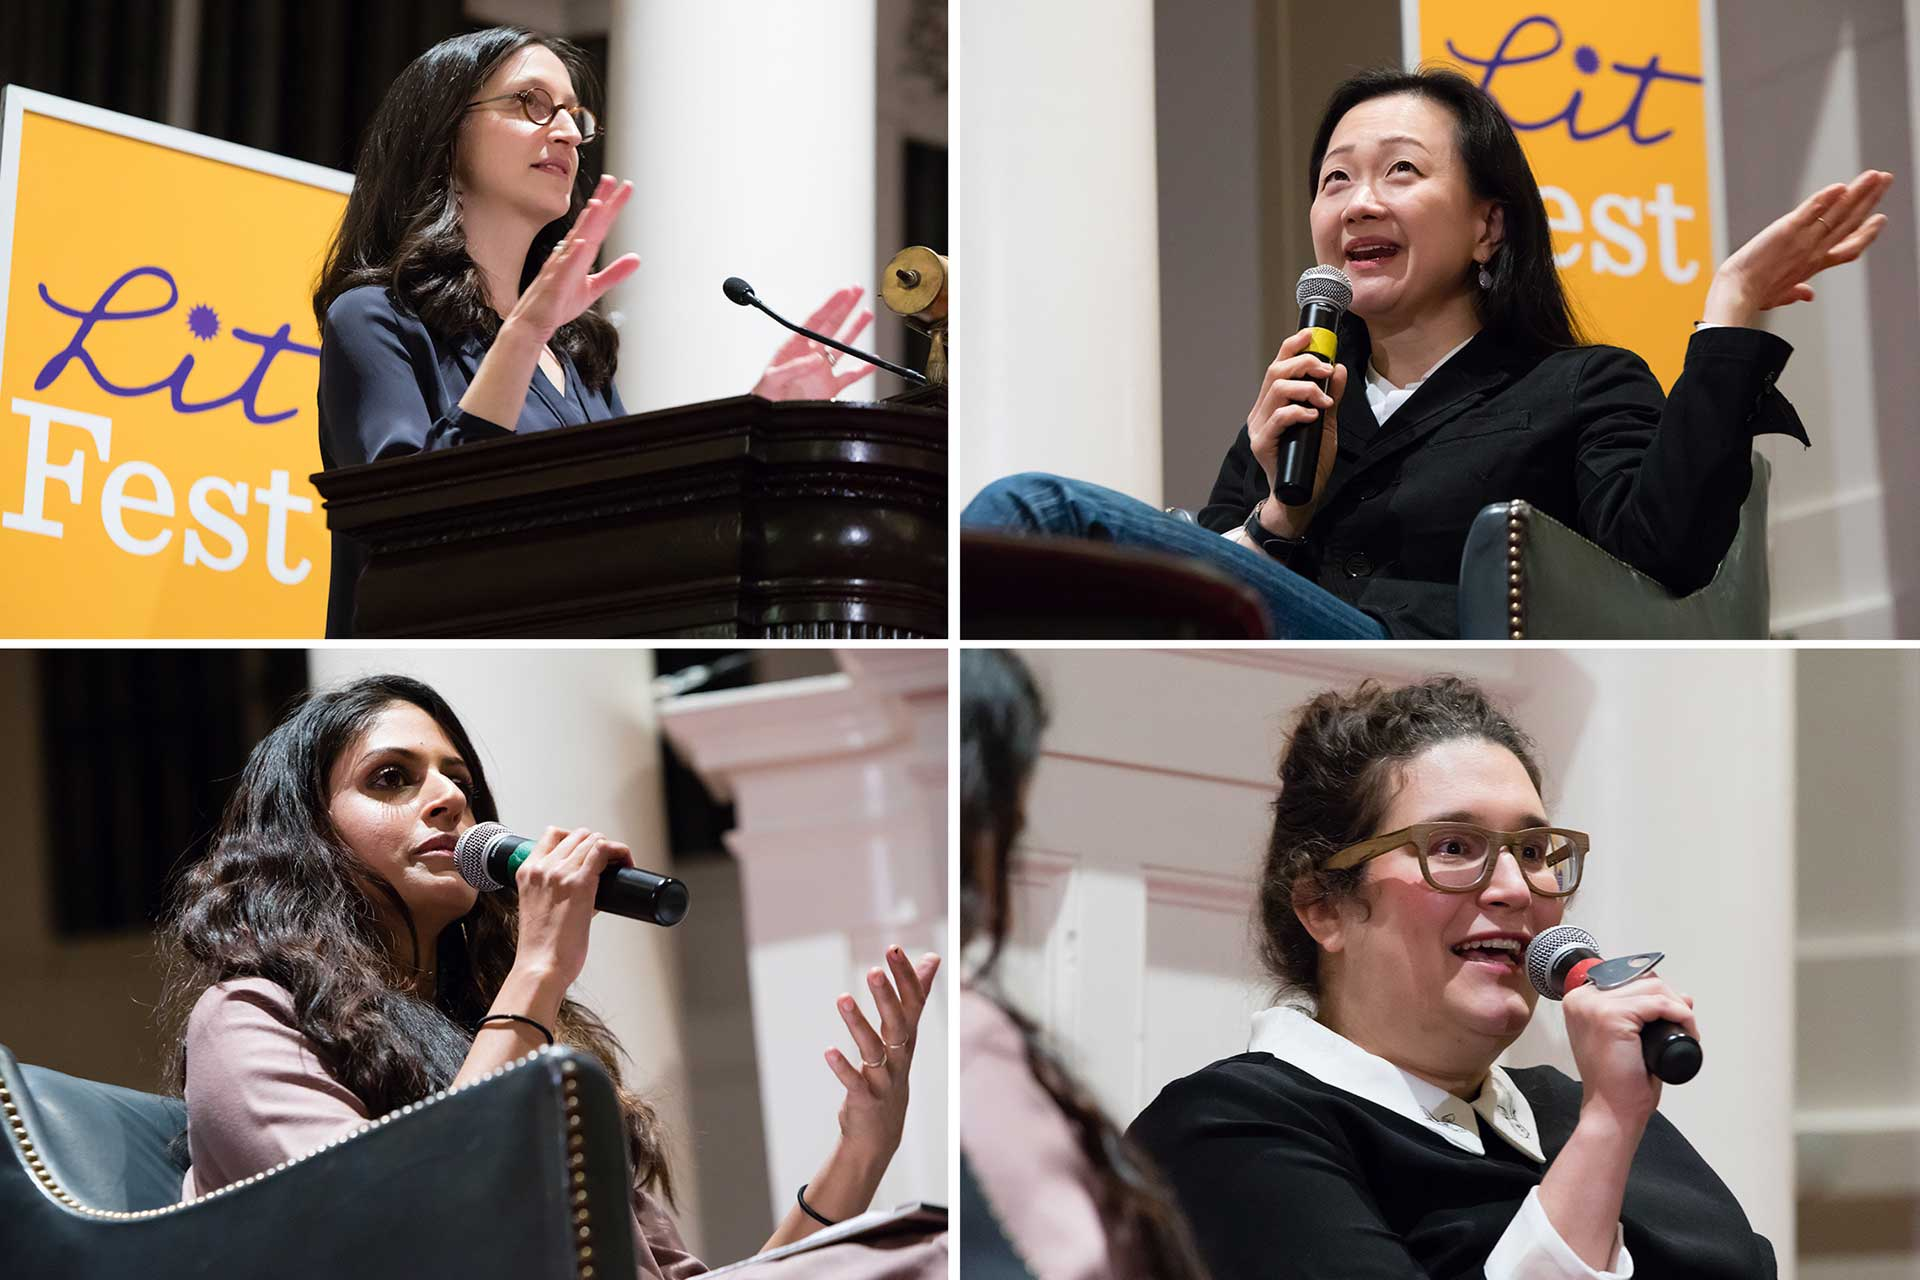 Jen Acker, Min Jin Lee, Parul Sehgal, and Carmen Maria Machado